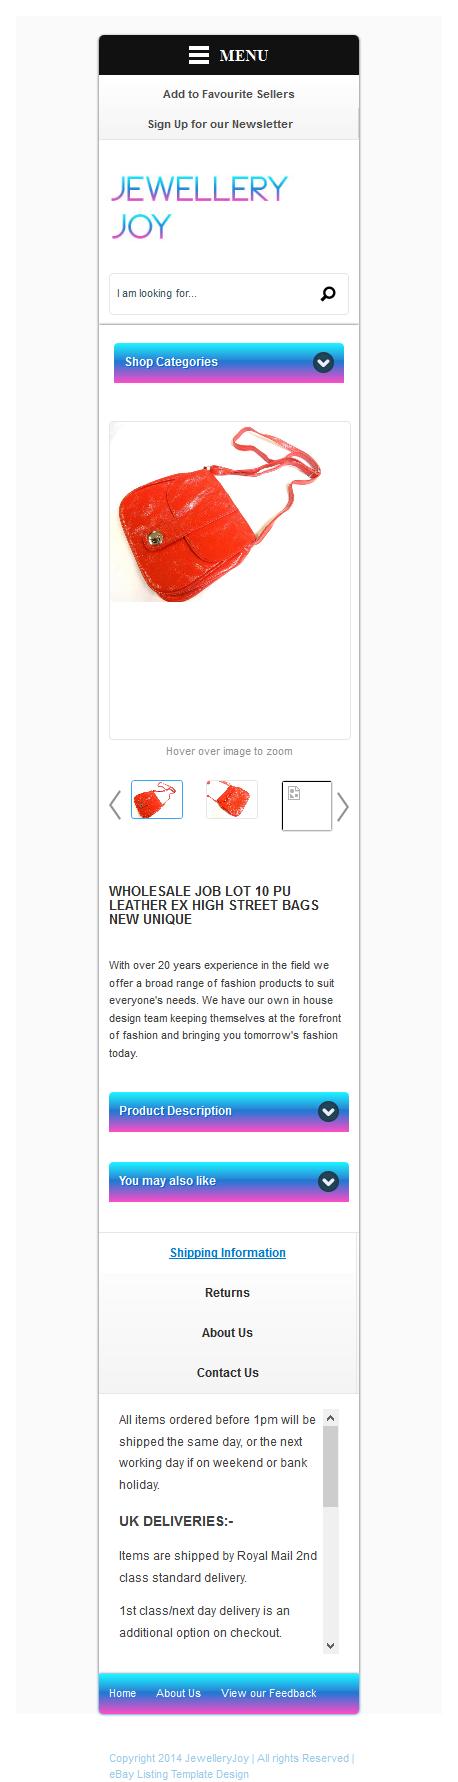 Smartphone_ebay_item_template